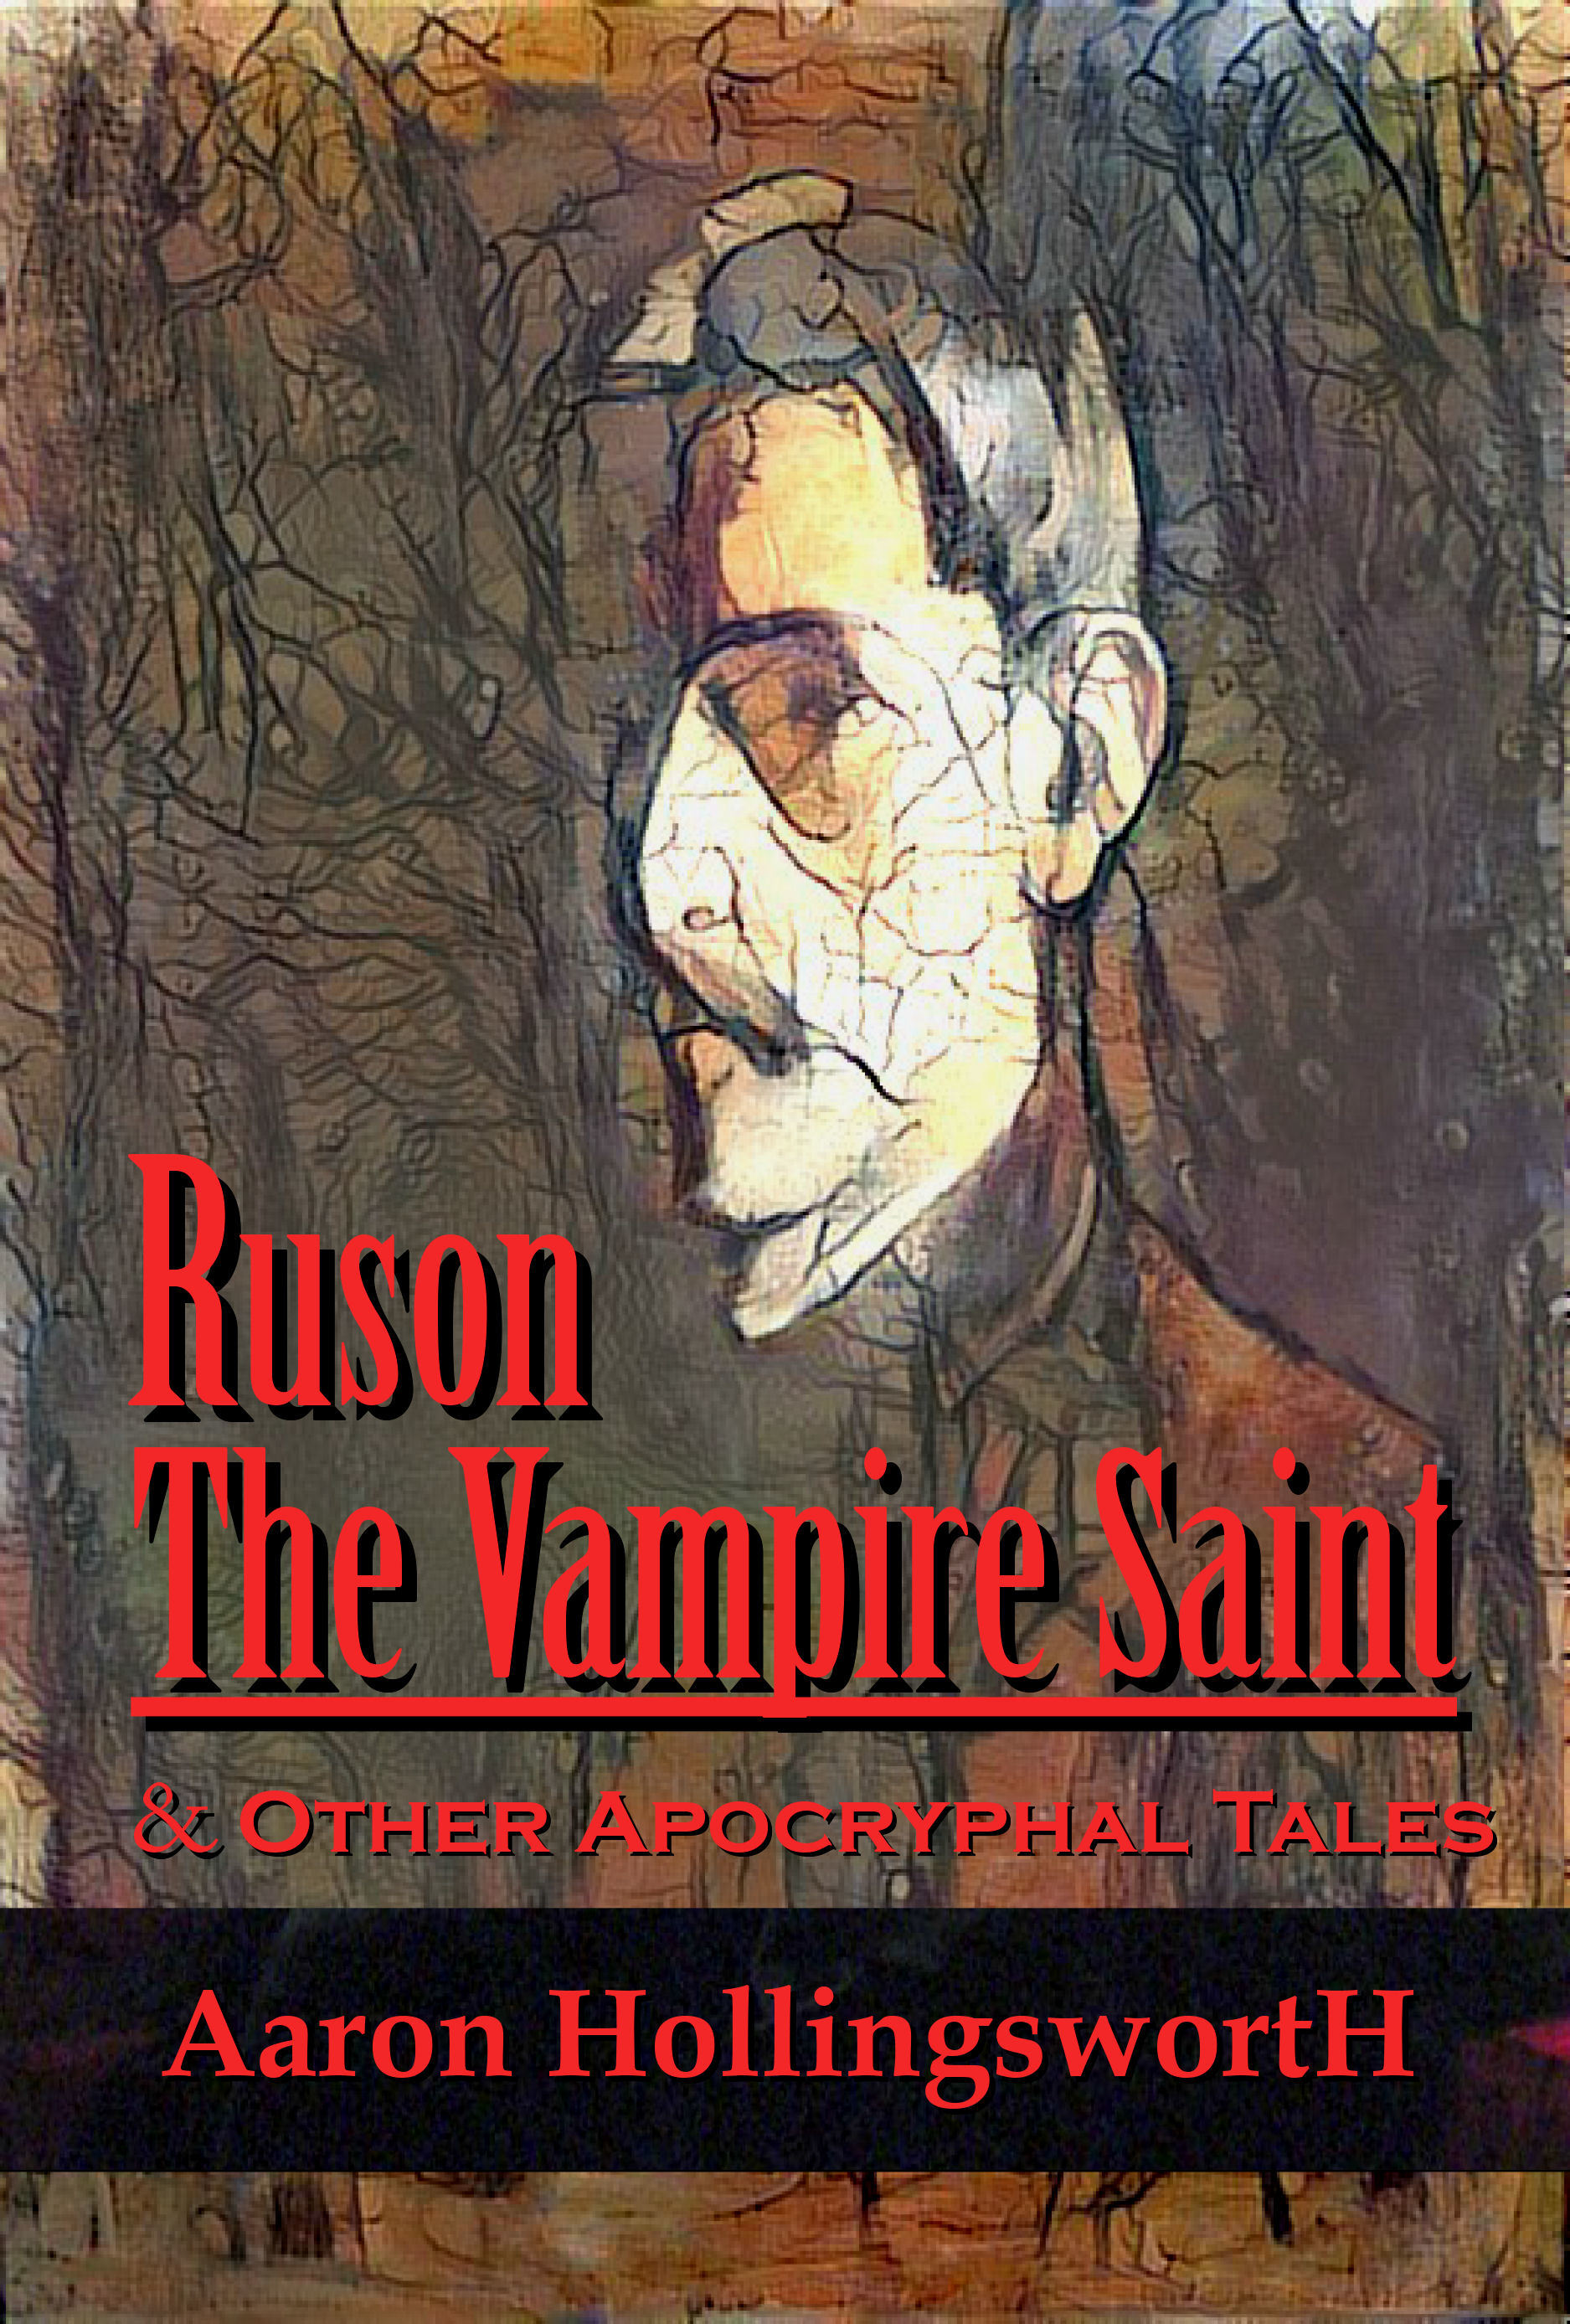 Ruson the Vampire Saint & Other Apocryphal Tales